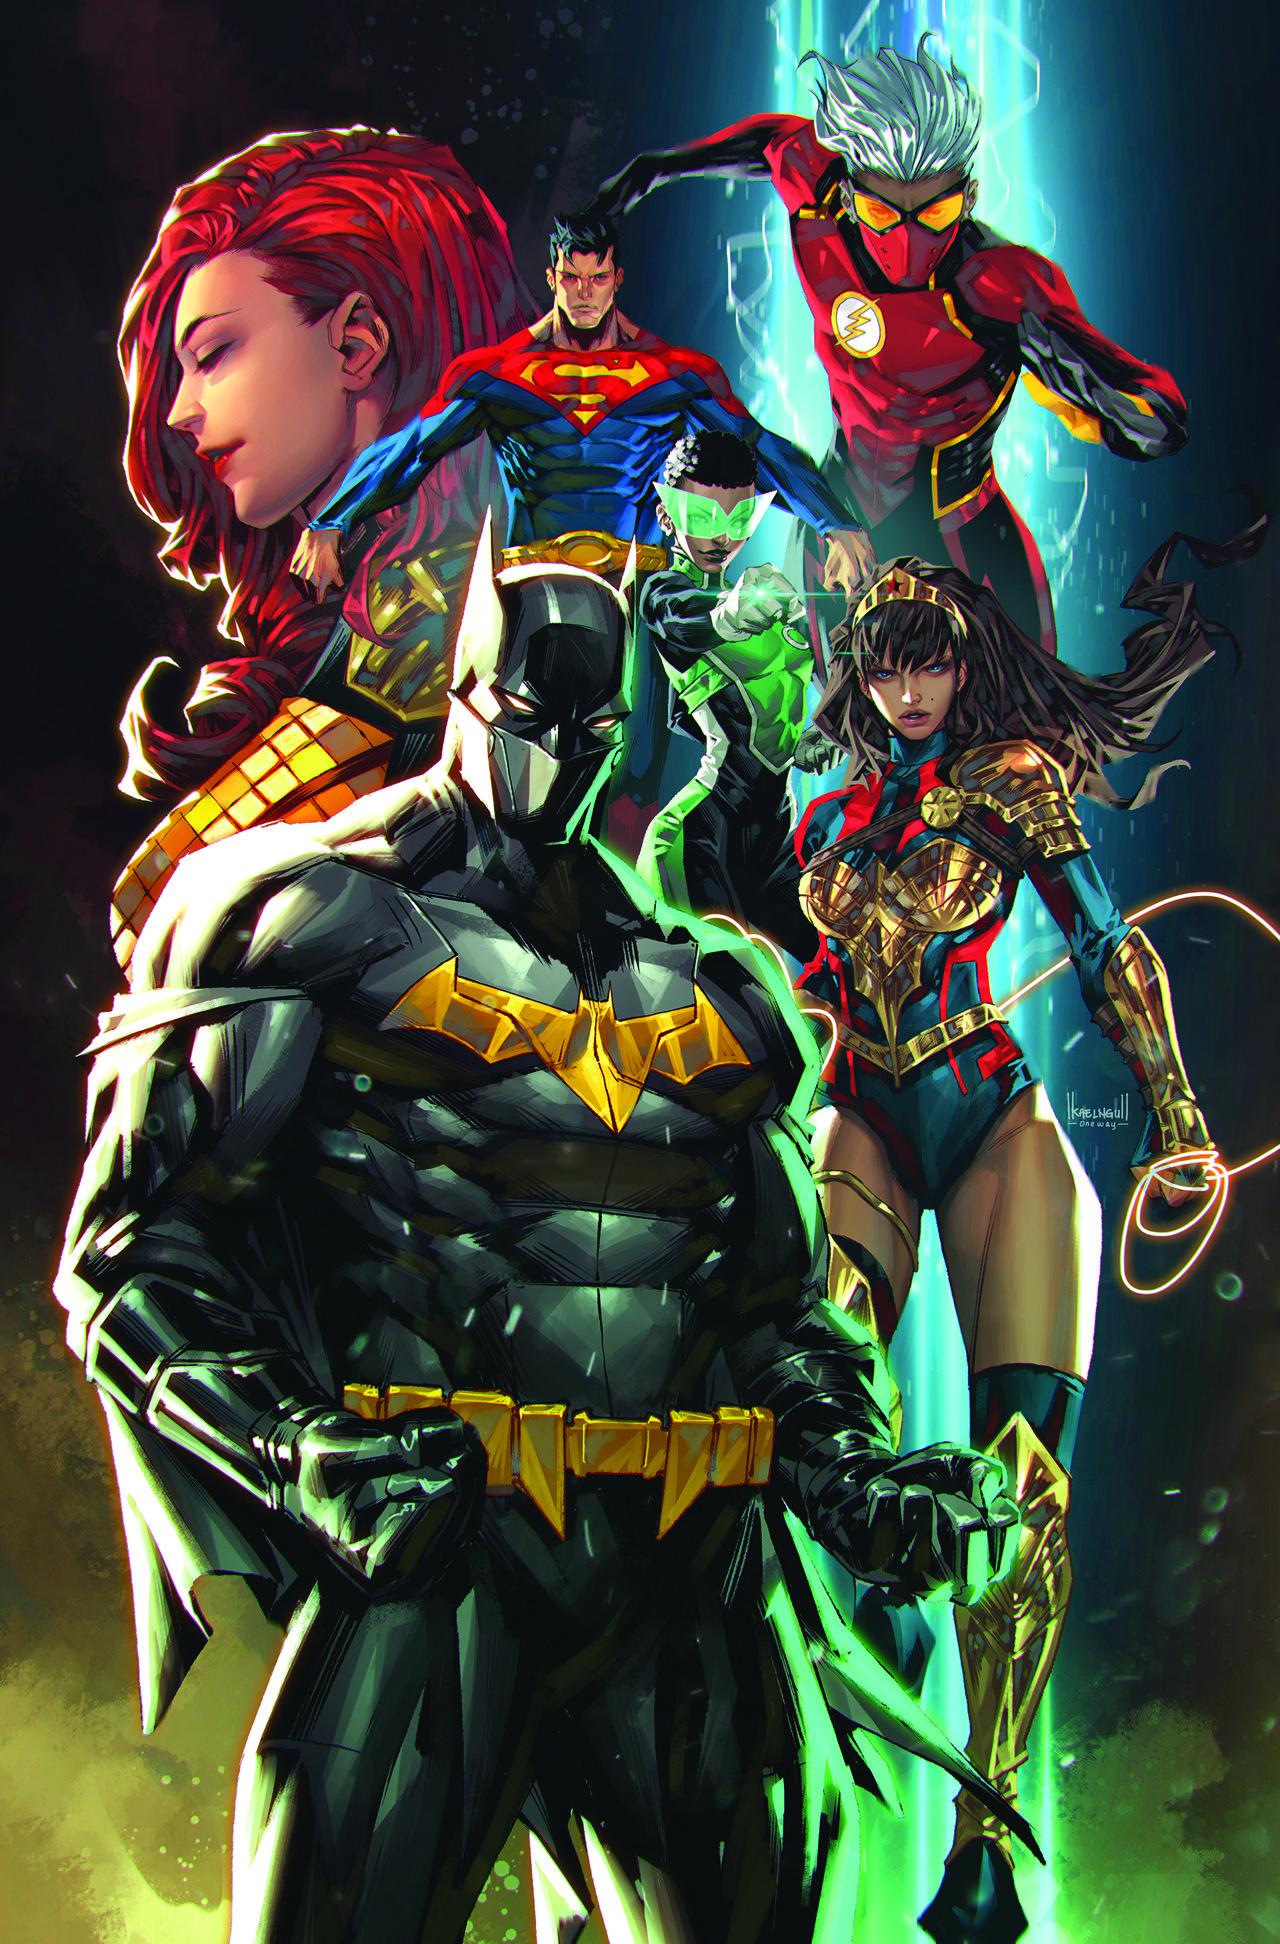 Dc Future State Superman And Justice League January 2021 Solicitations Dc Comics Heroes Dc Comics Superheroes Dc Comics Artwork